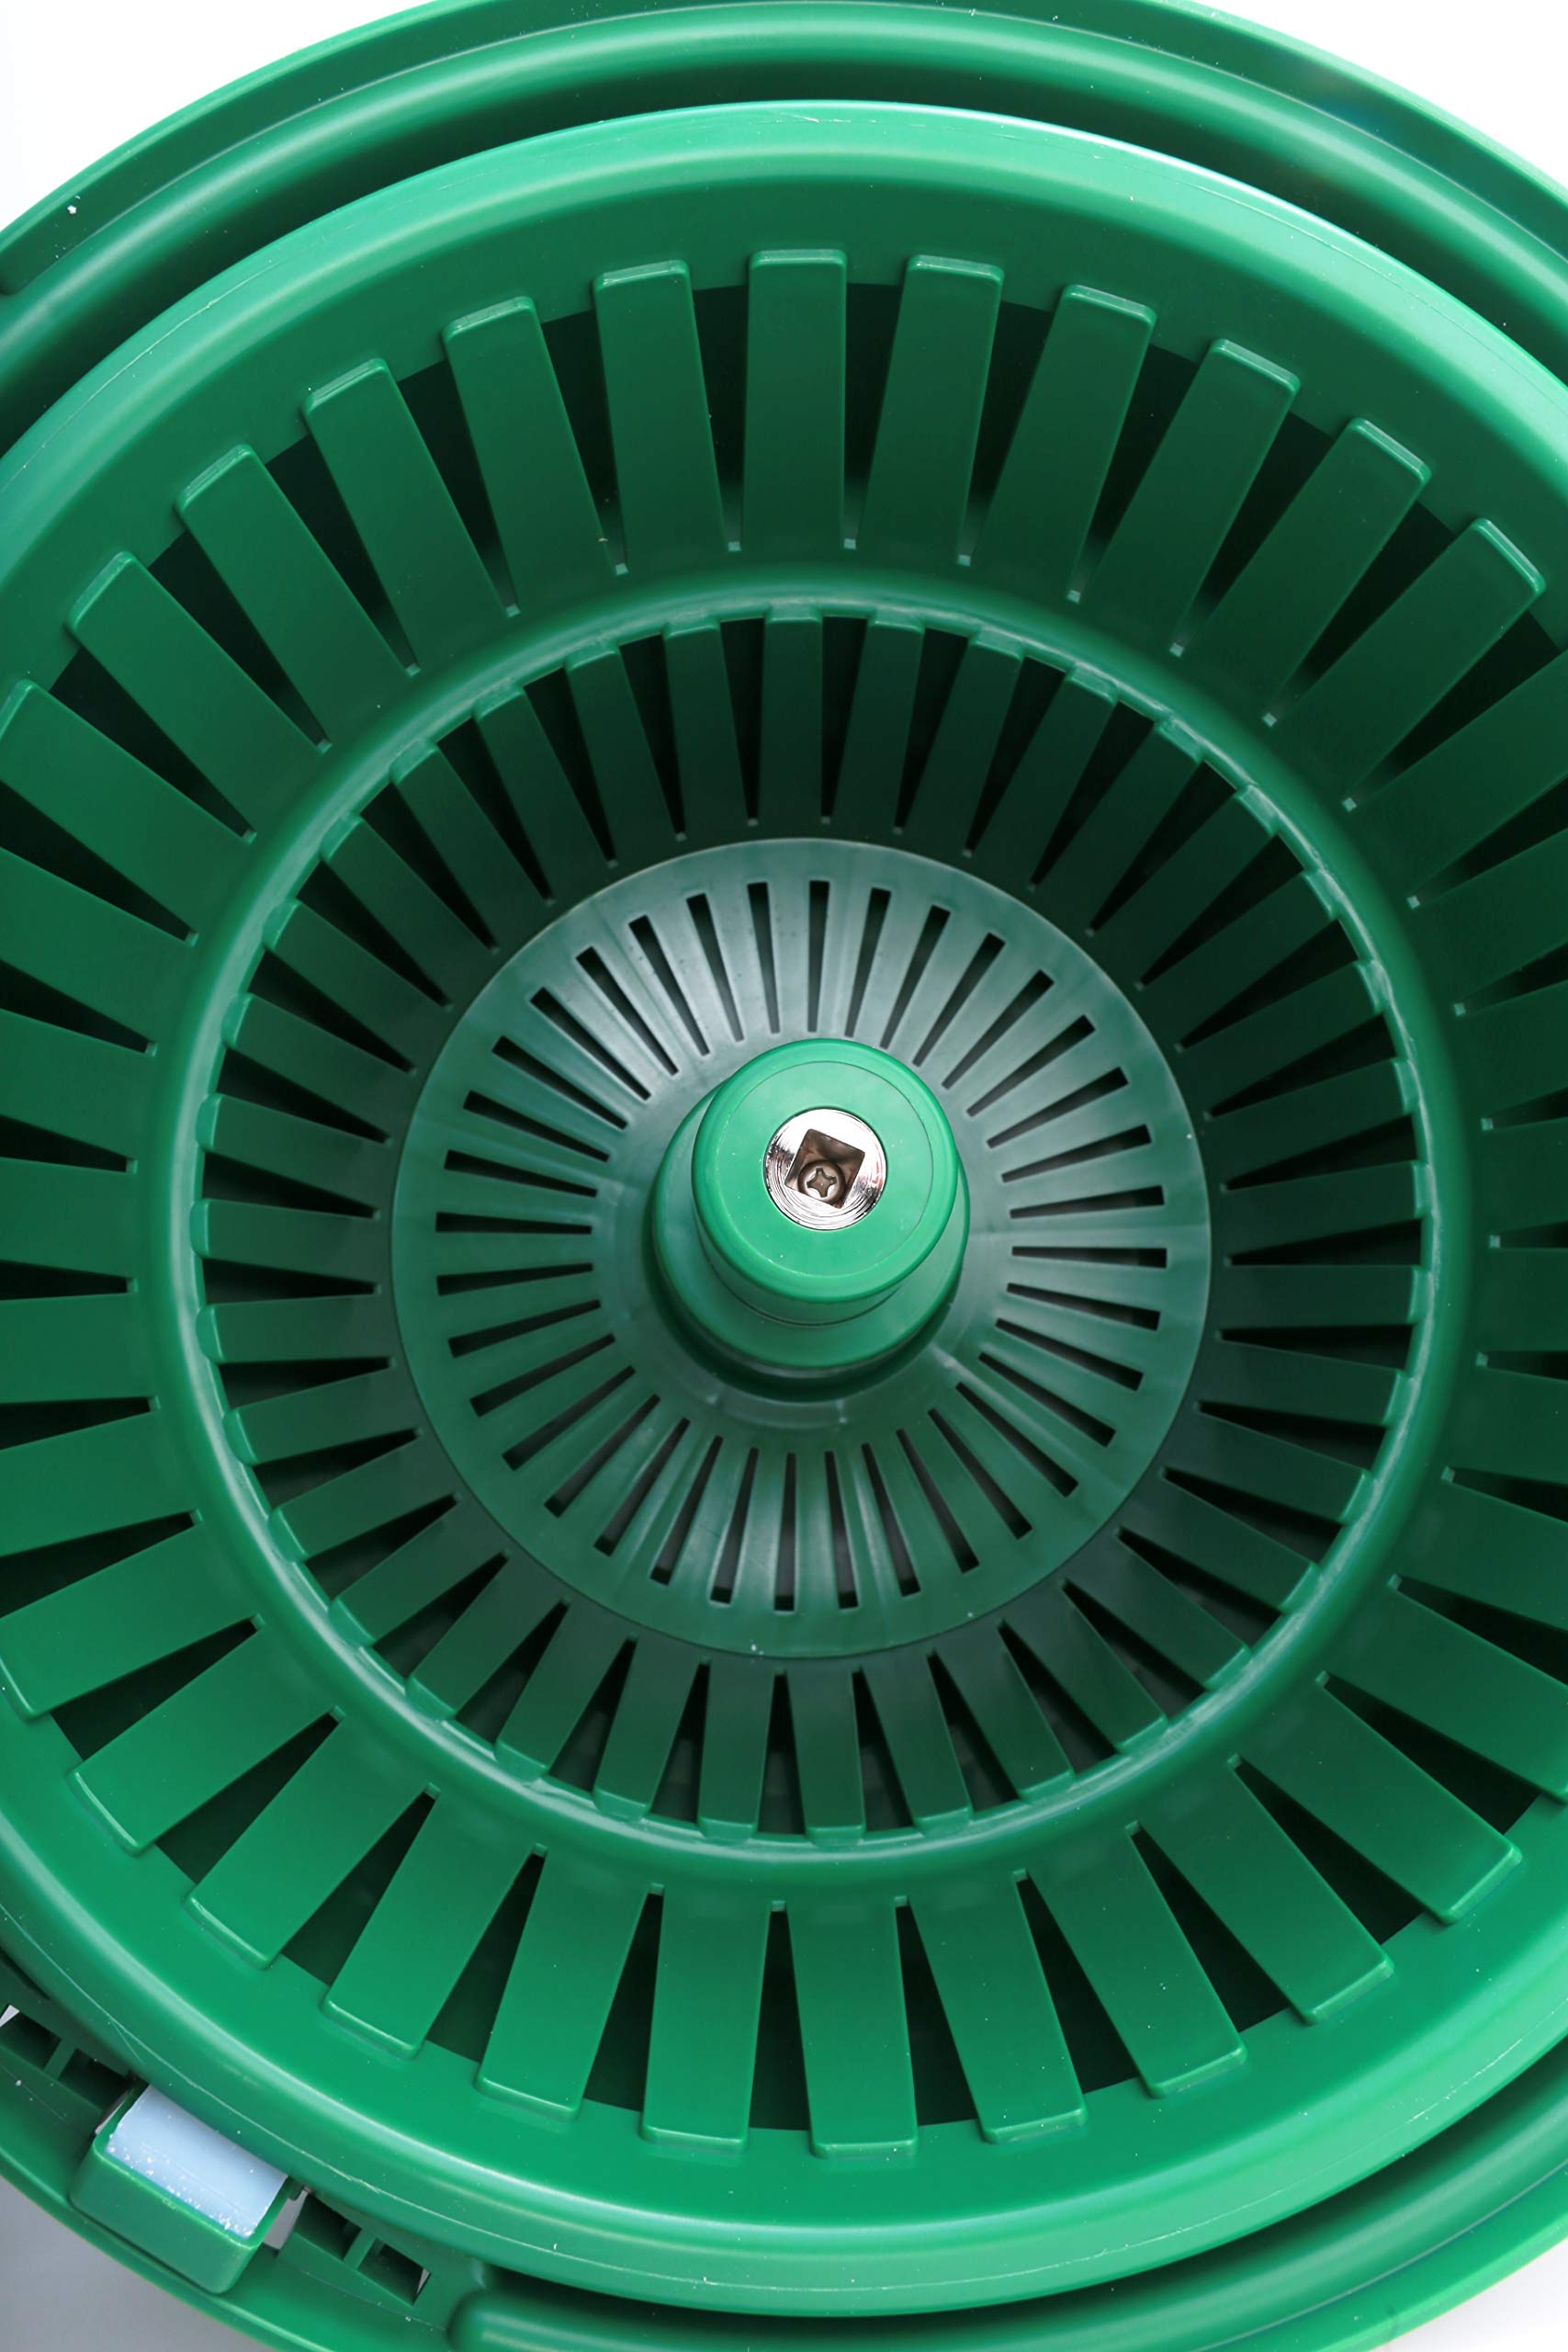 Hakka 20 Liter/5 Gallon Large Commercial Manual Salad Spinner&Dryer by HAKKA FOOD PROCESSING (Image #3)